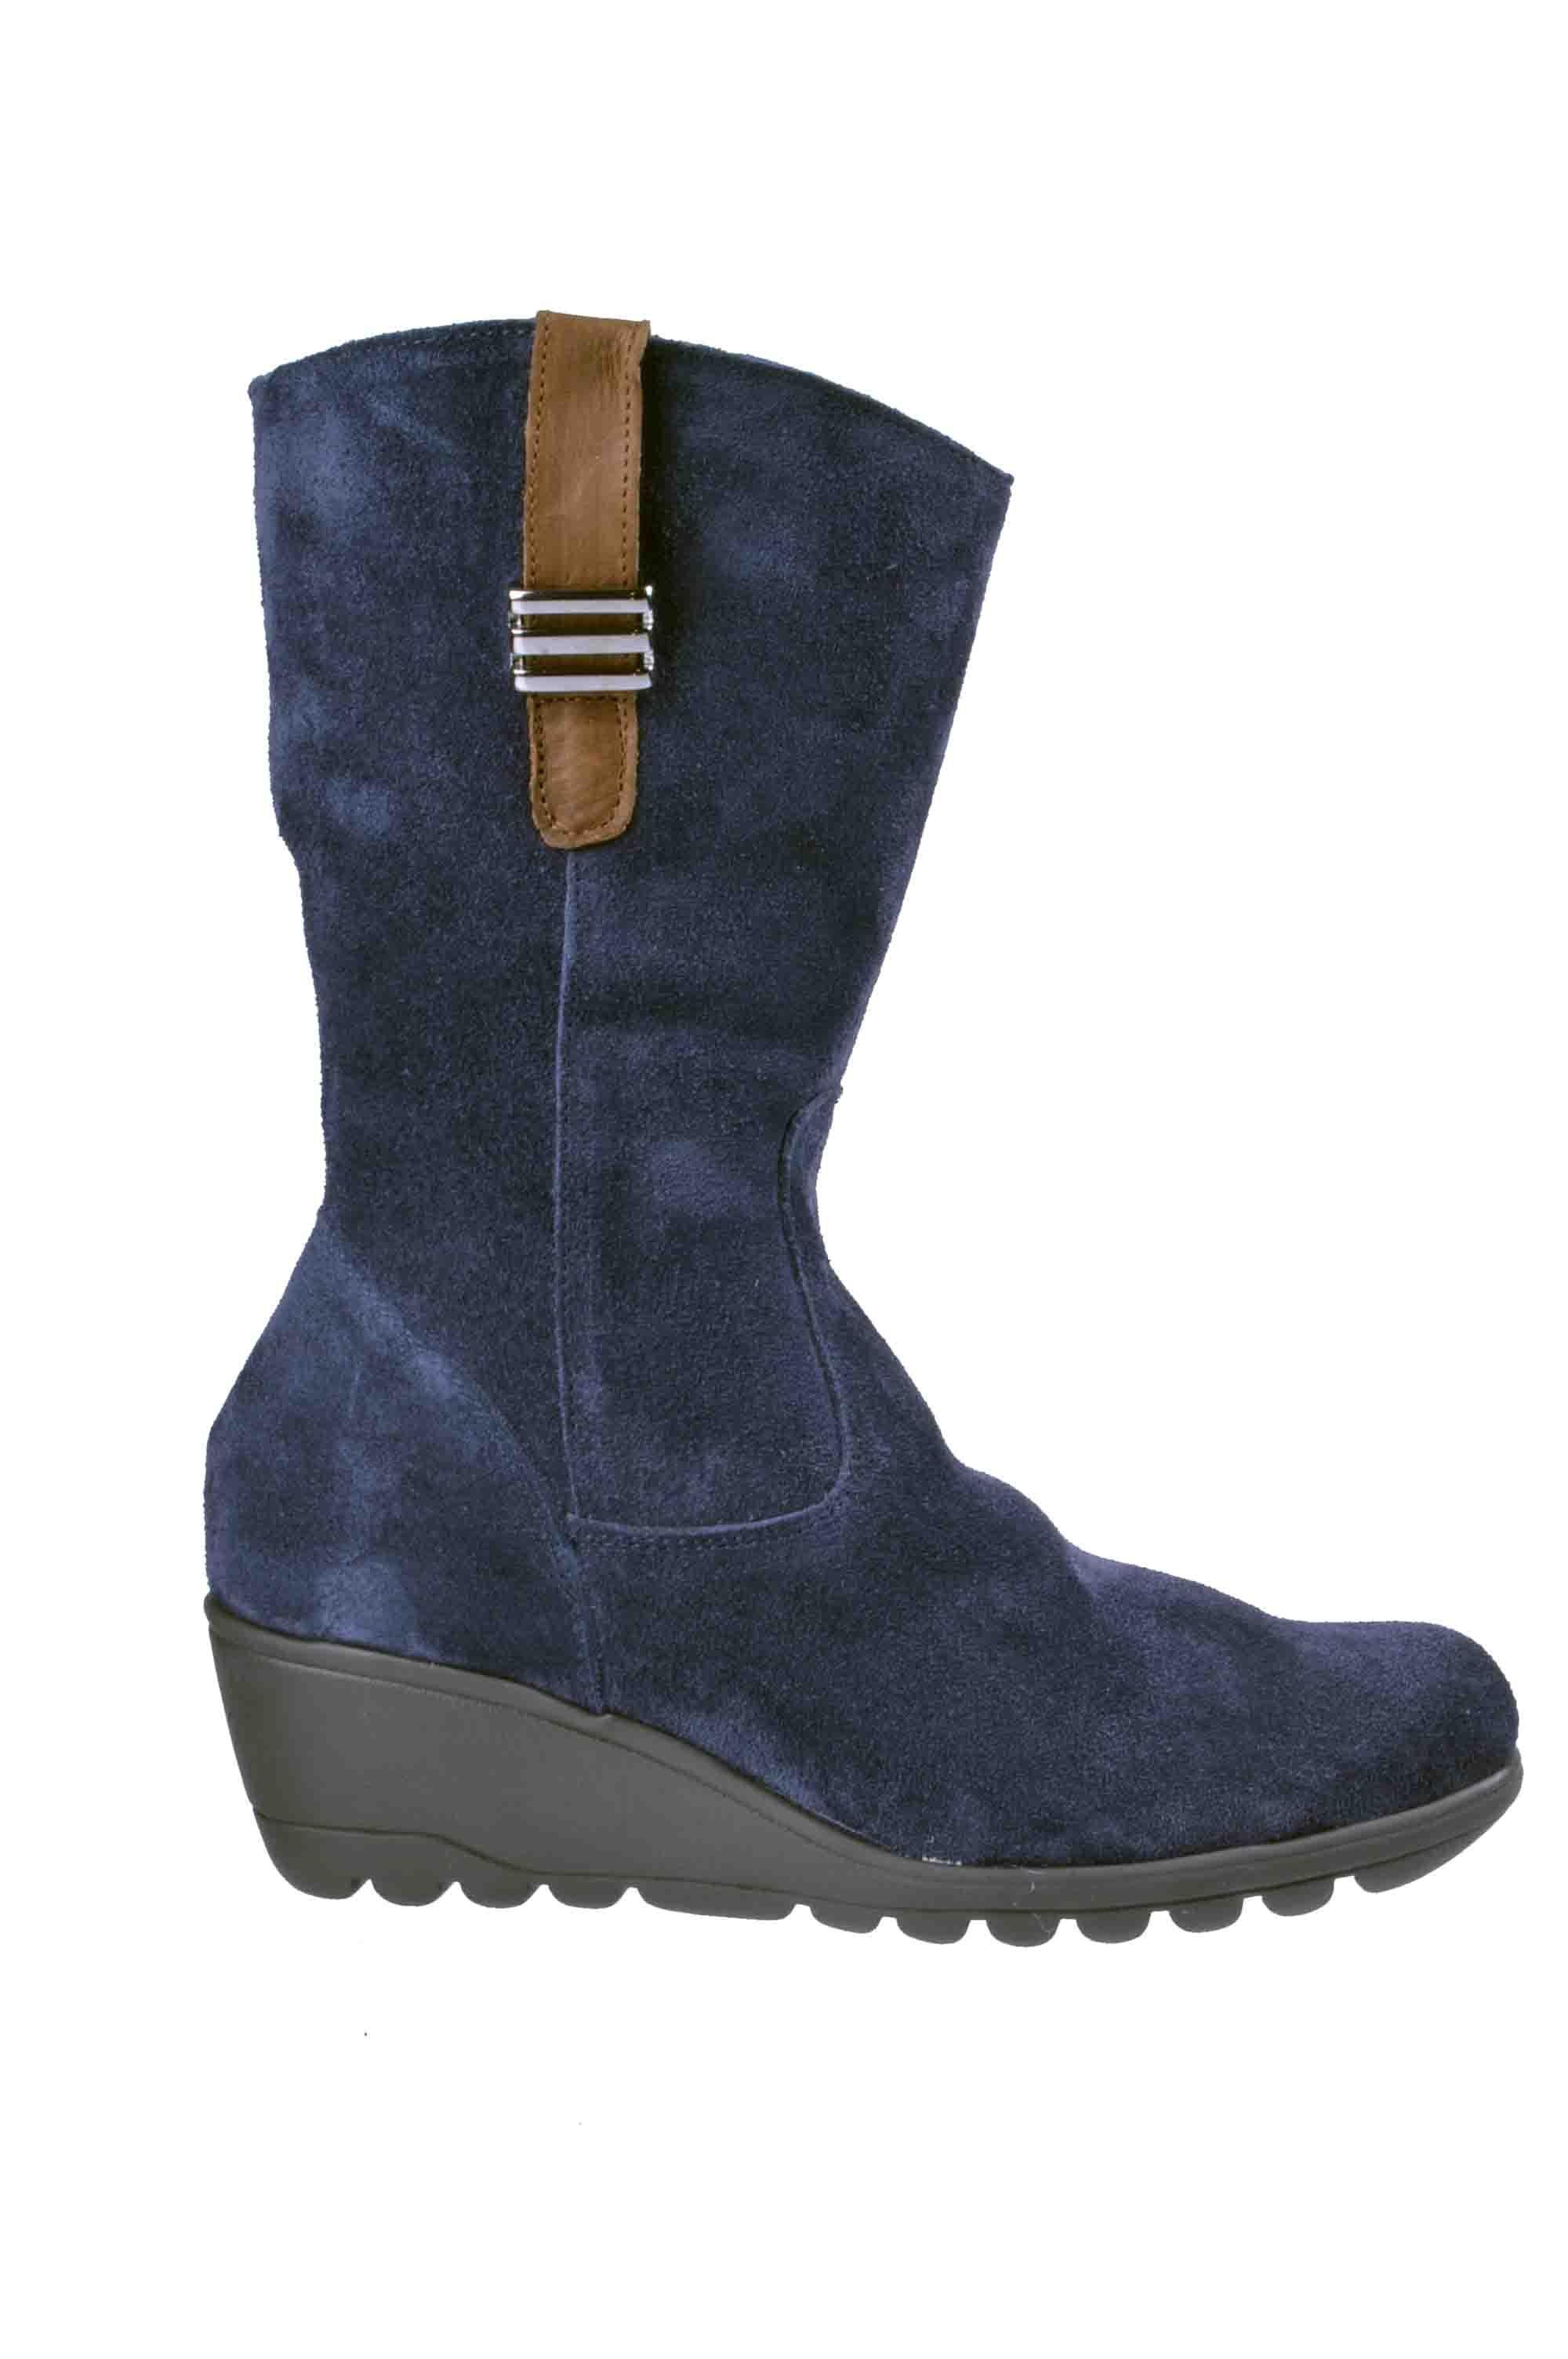 7d76a08e3ec ... Γυναικεια Δερματινα Μποτακια Apostolidis Shoes City Boot Μπλε ...